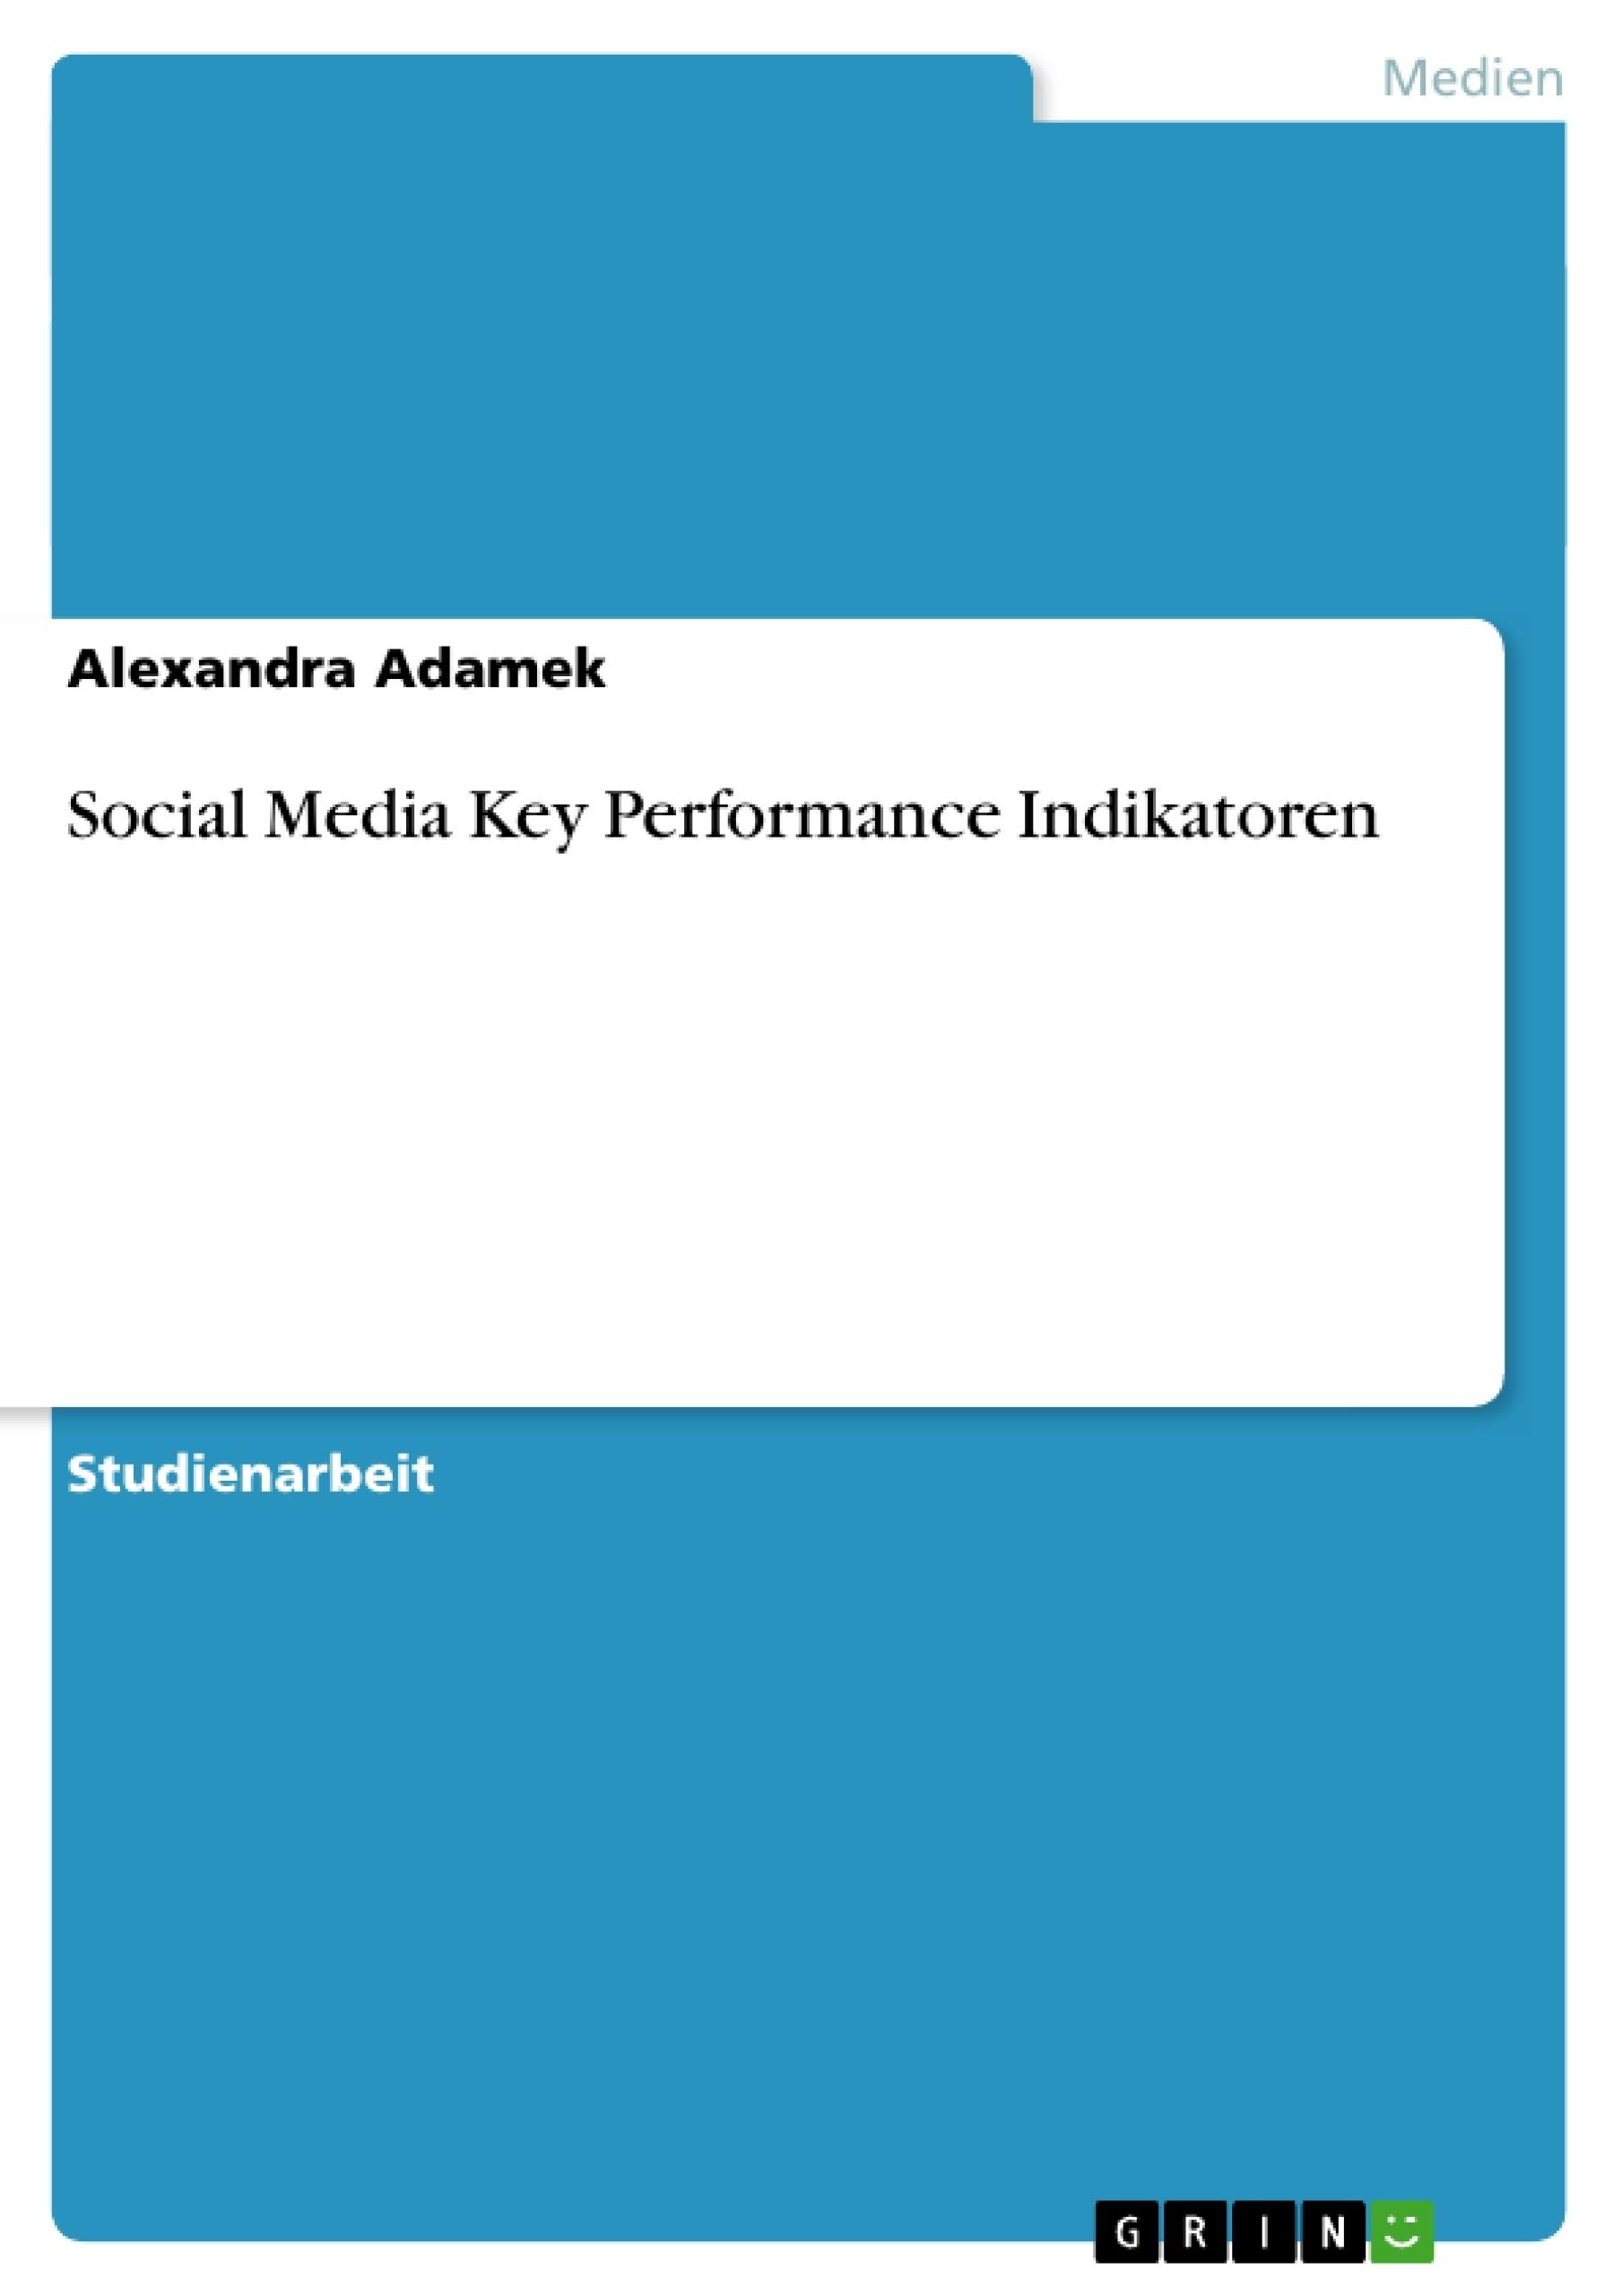 Titel: Social Media Key Performance Indikatoren